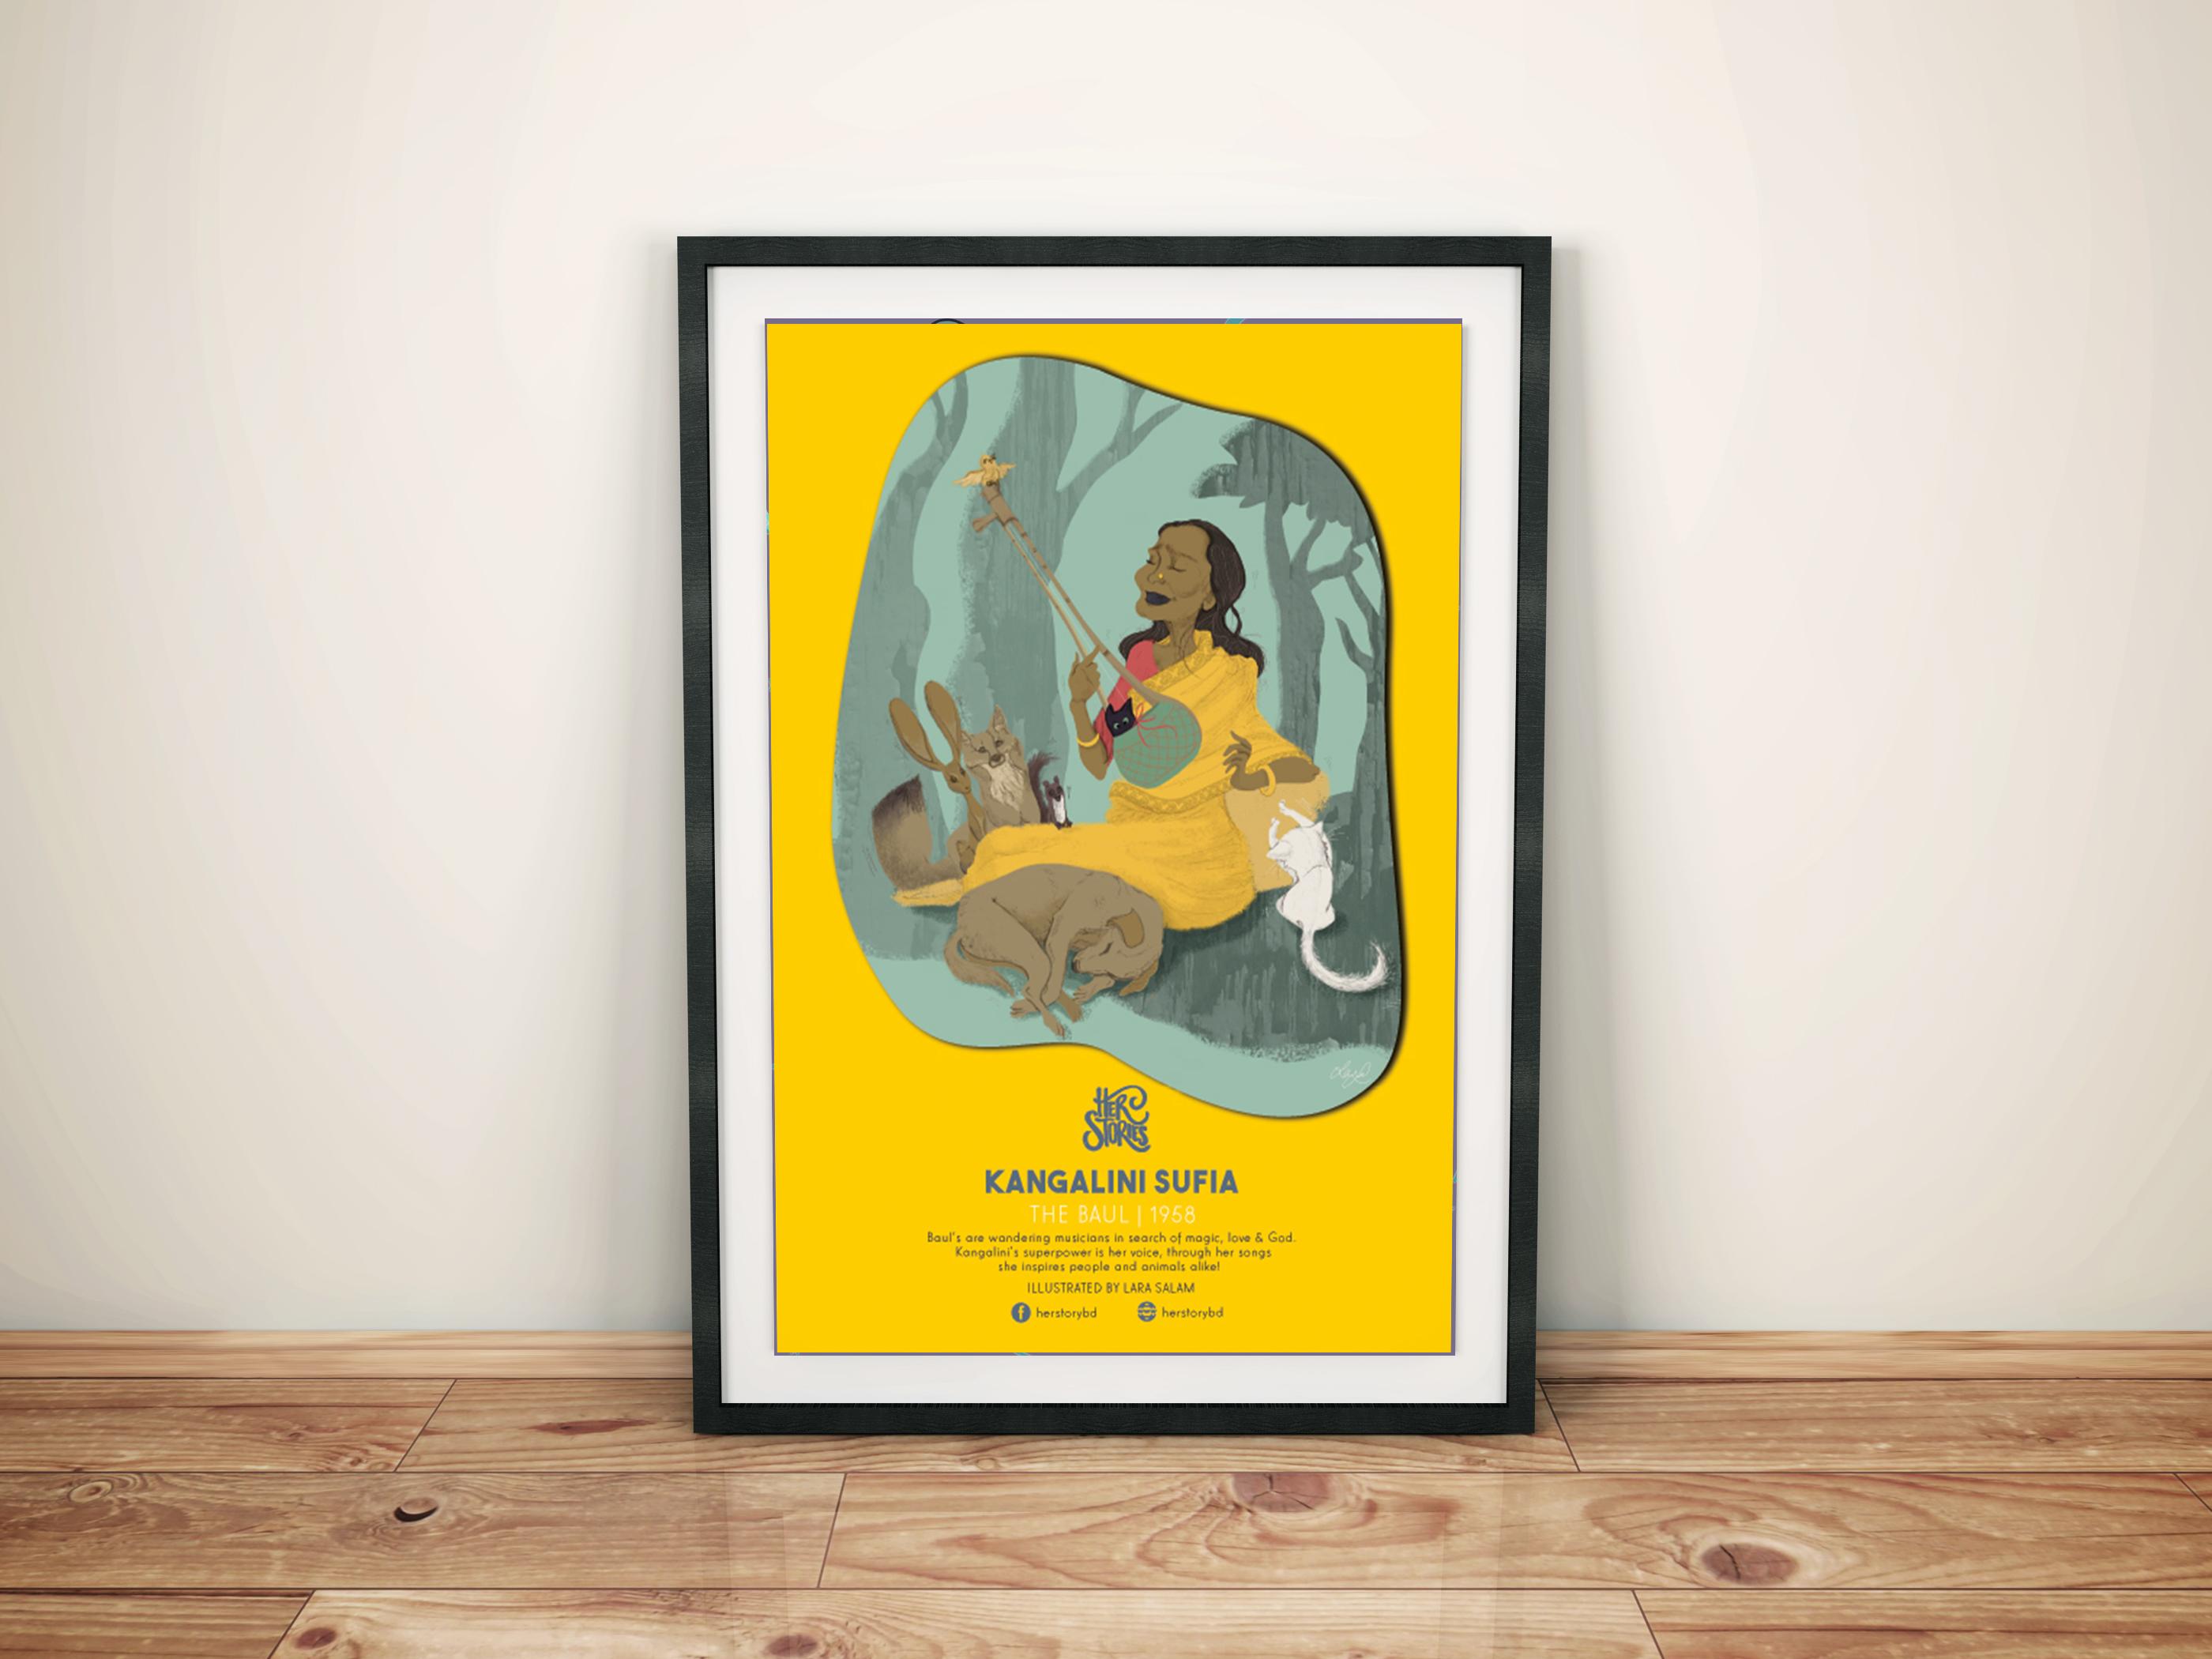 Kangalini Sufia Poster